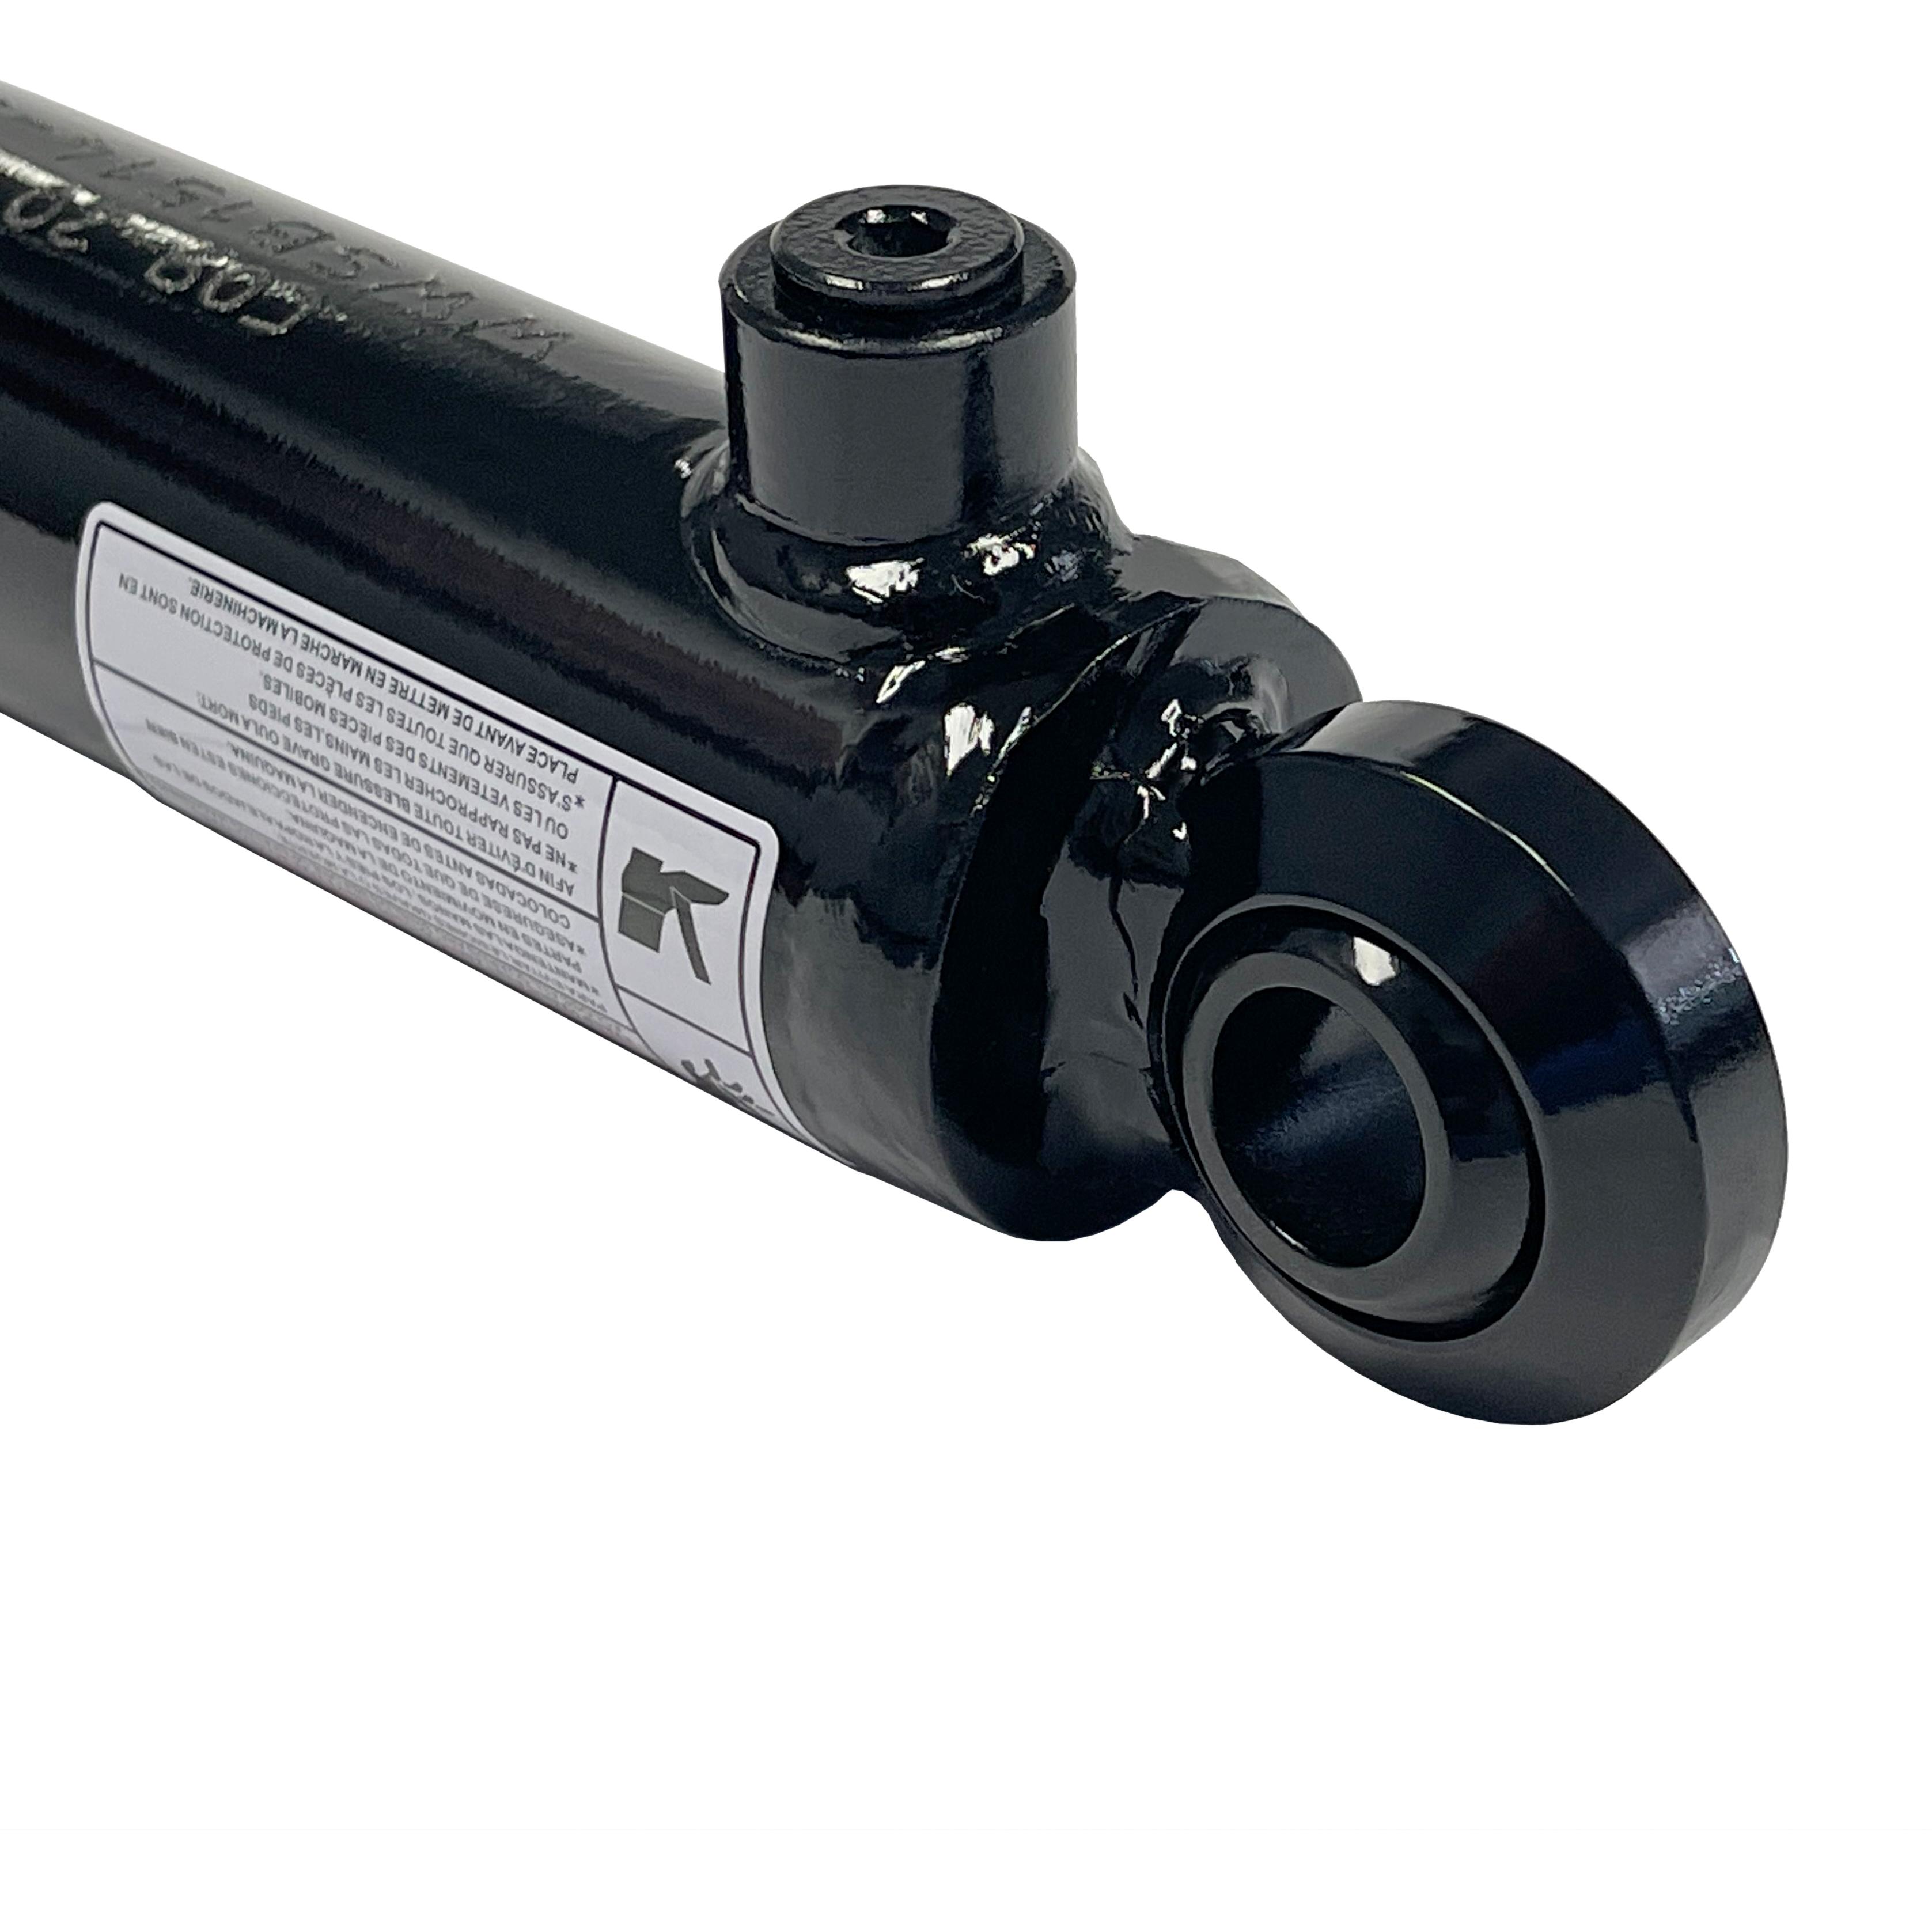 1.5 bore x 10 stroke swivel eye hydraulic cylinder, welded swivel eye double acting cylinder | Prince Hydraulics